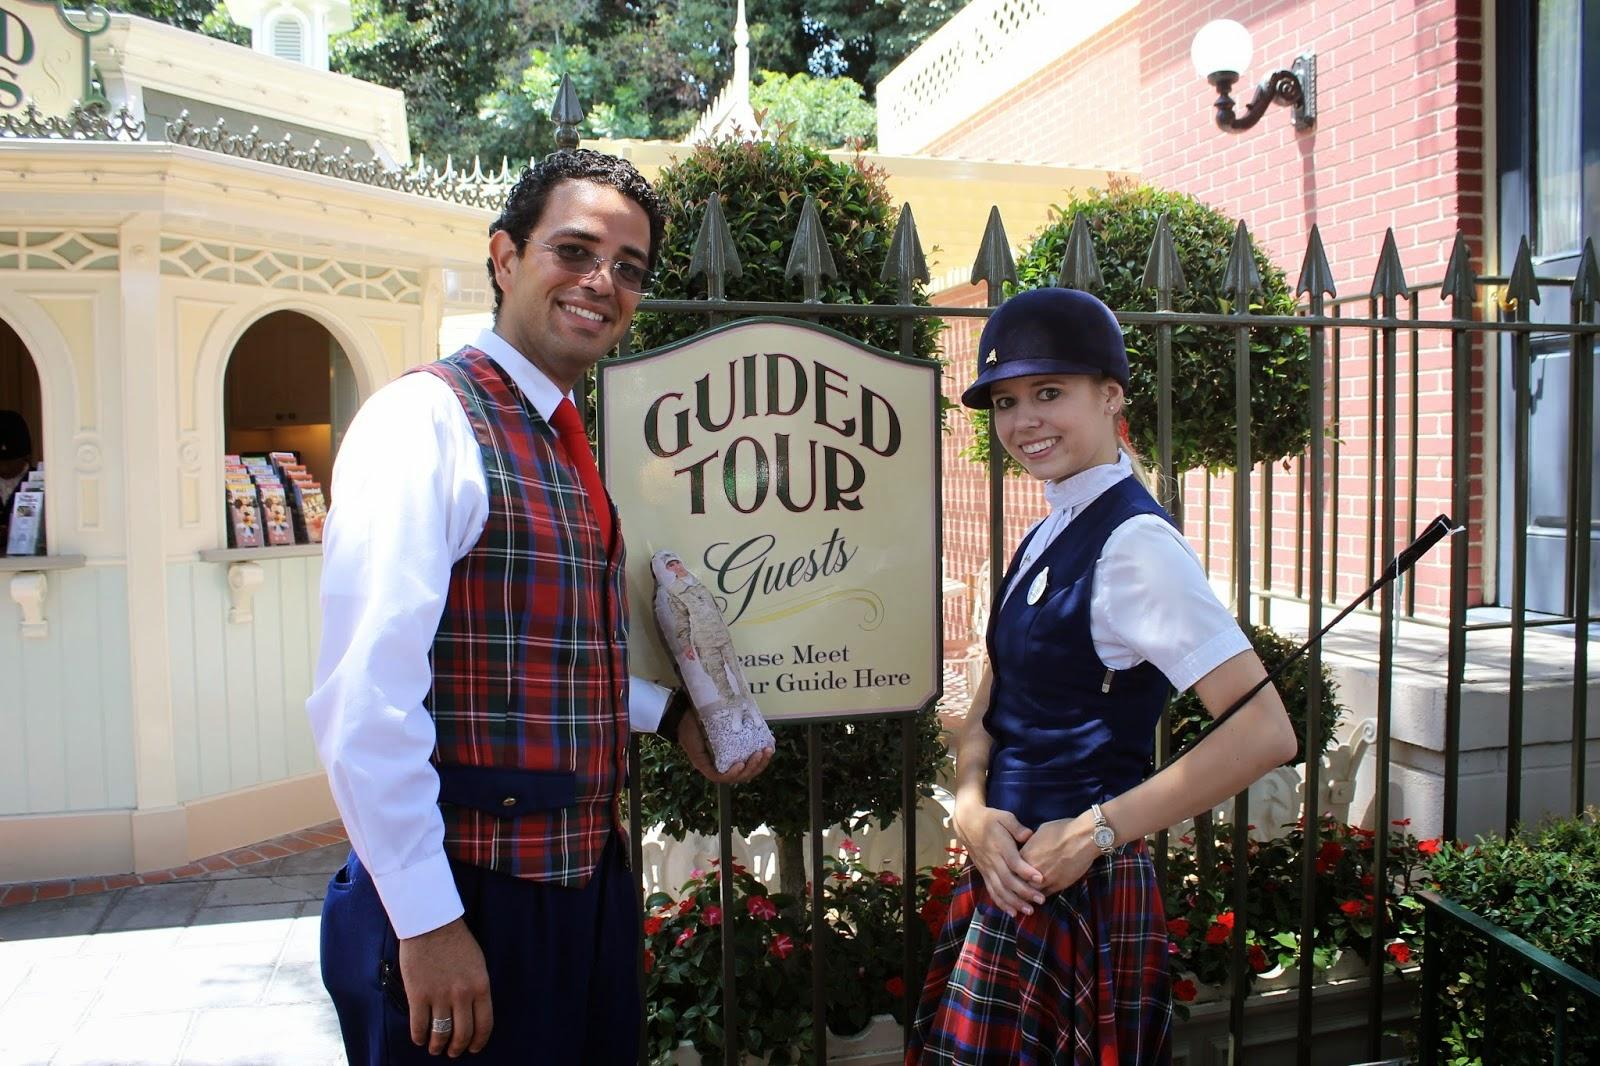 Vip tours of walt disney world.